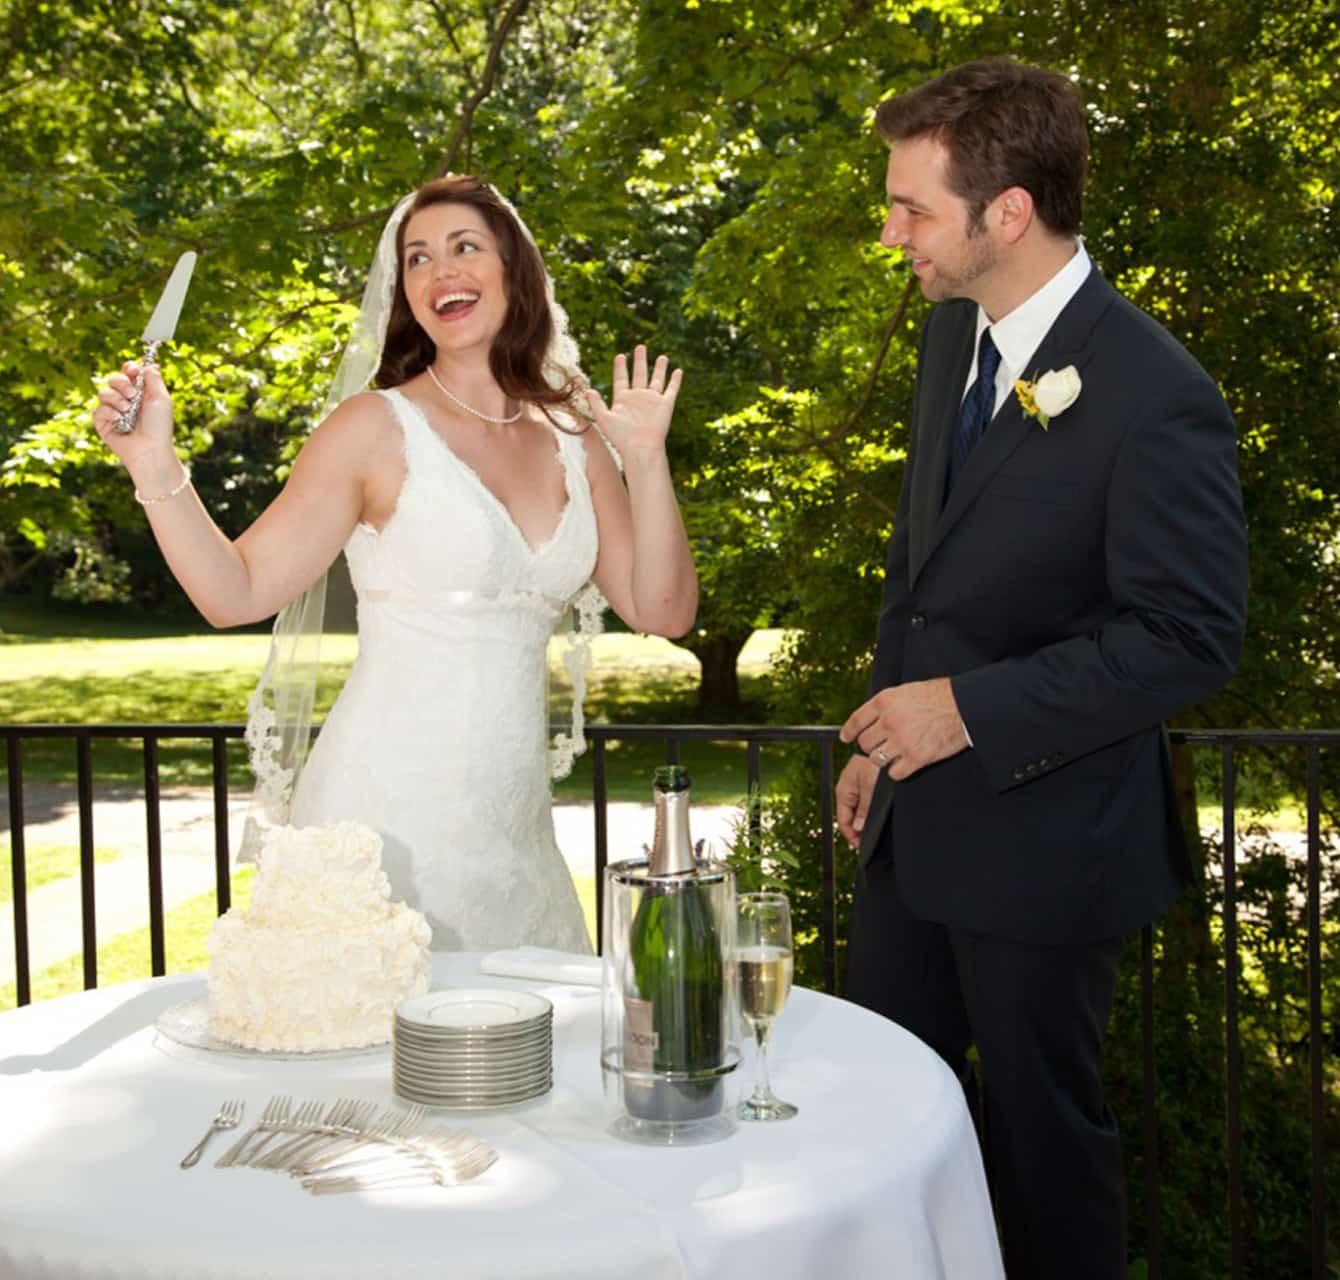 Married couple cutting wedding cake